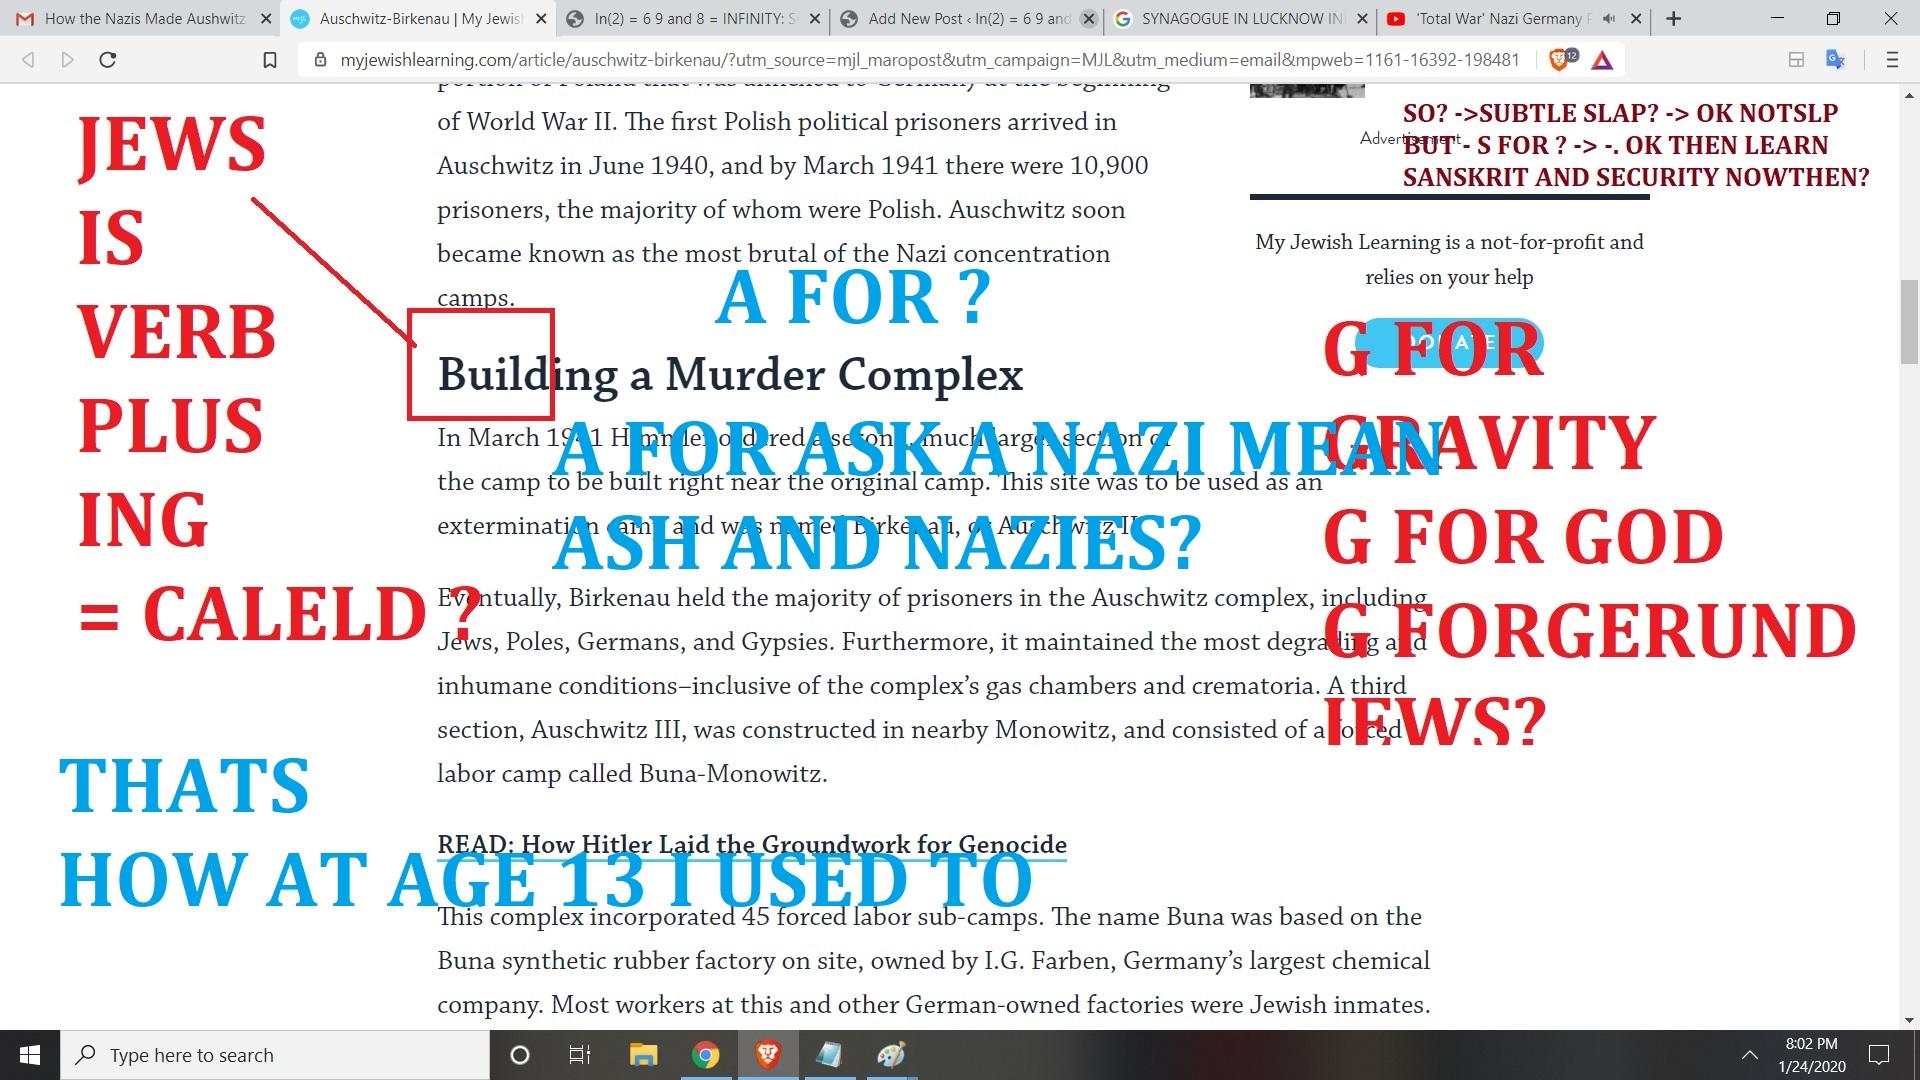 L FOR LANAGUEG J FOR JEWS